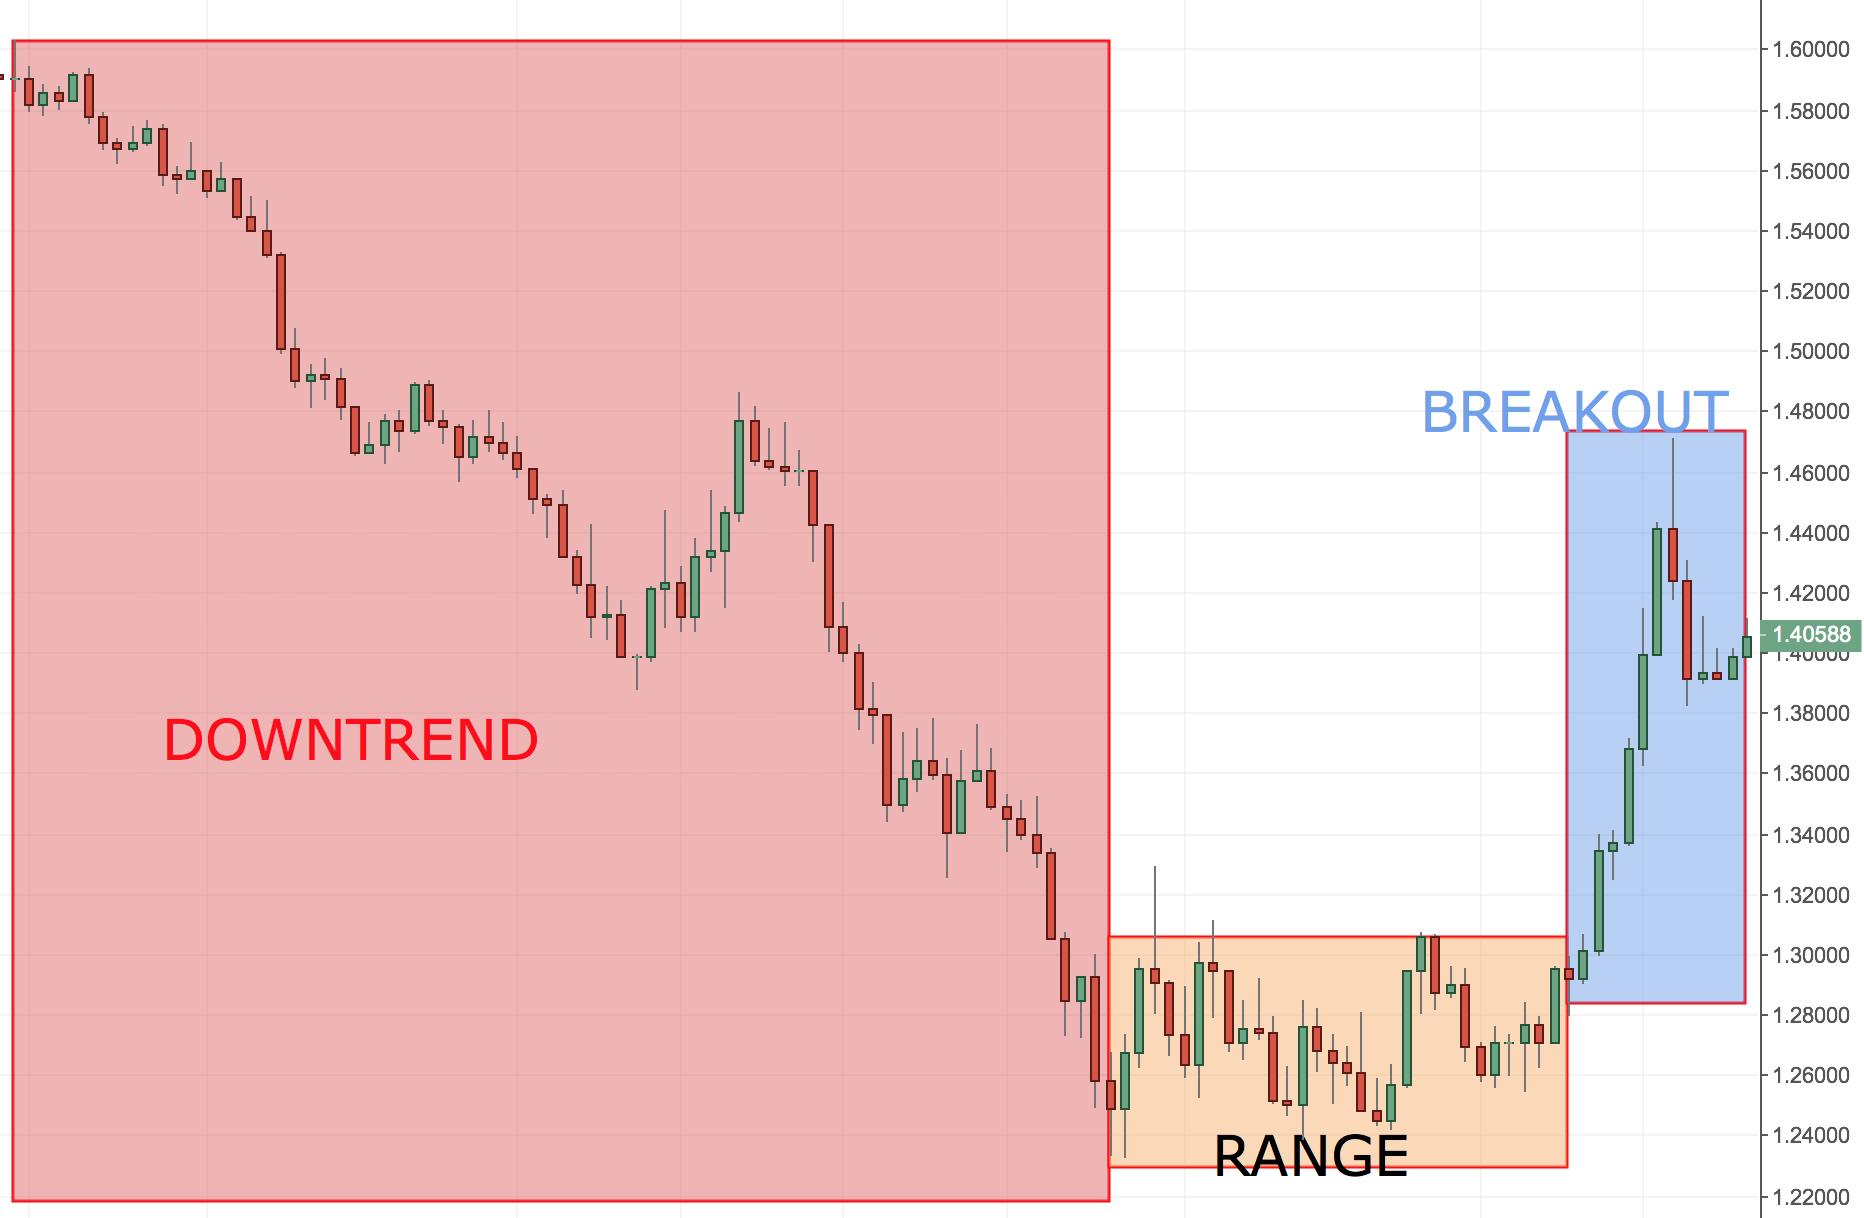 Trend vs Range